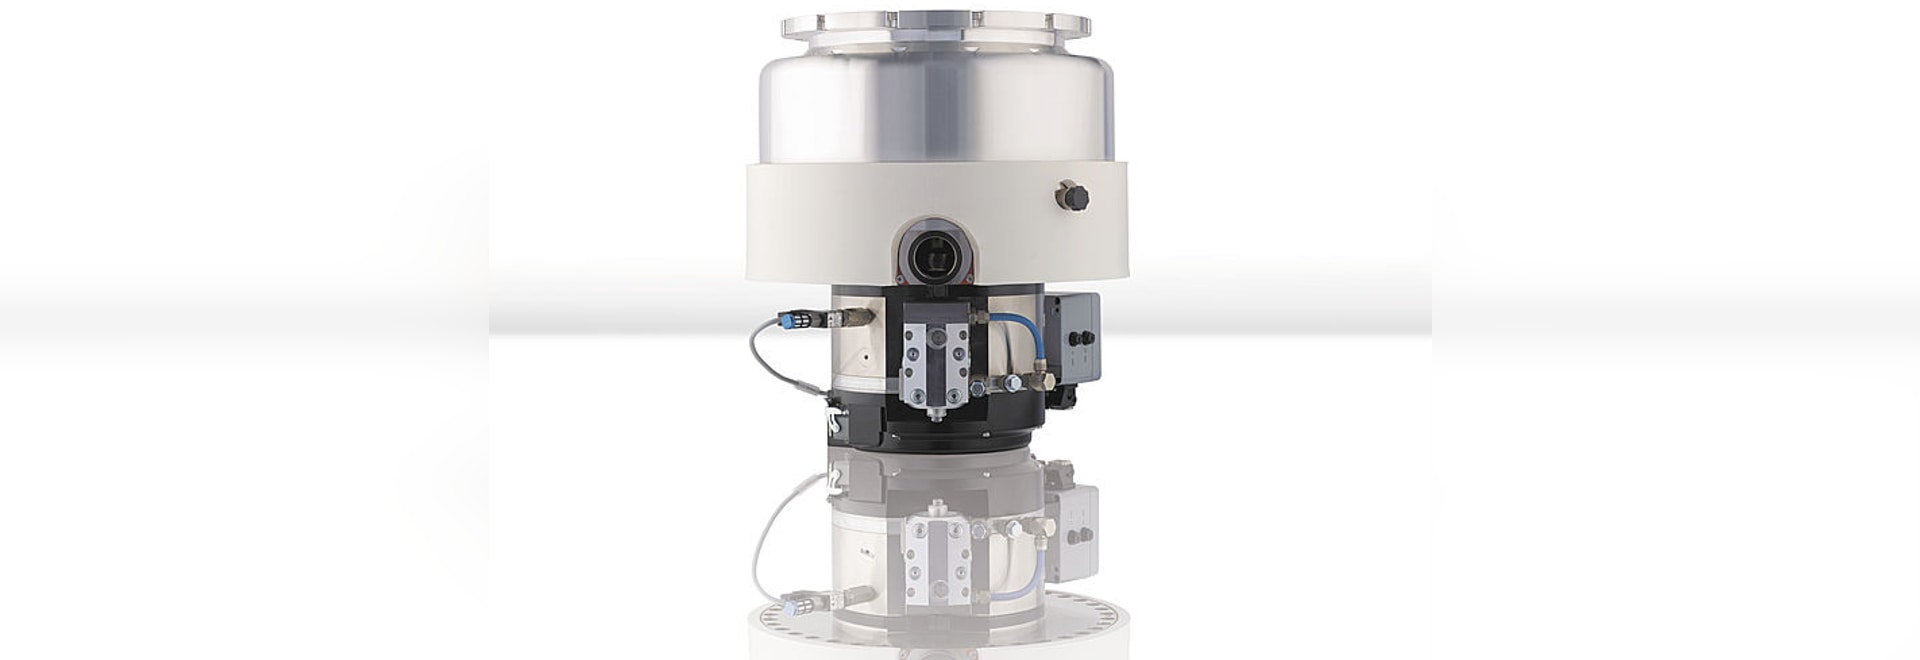 Turbopump HiPace 2800 IT